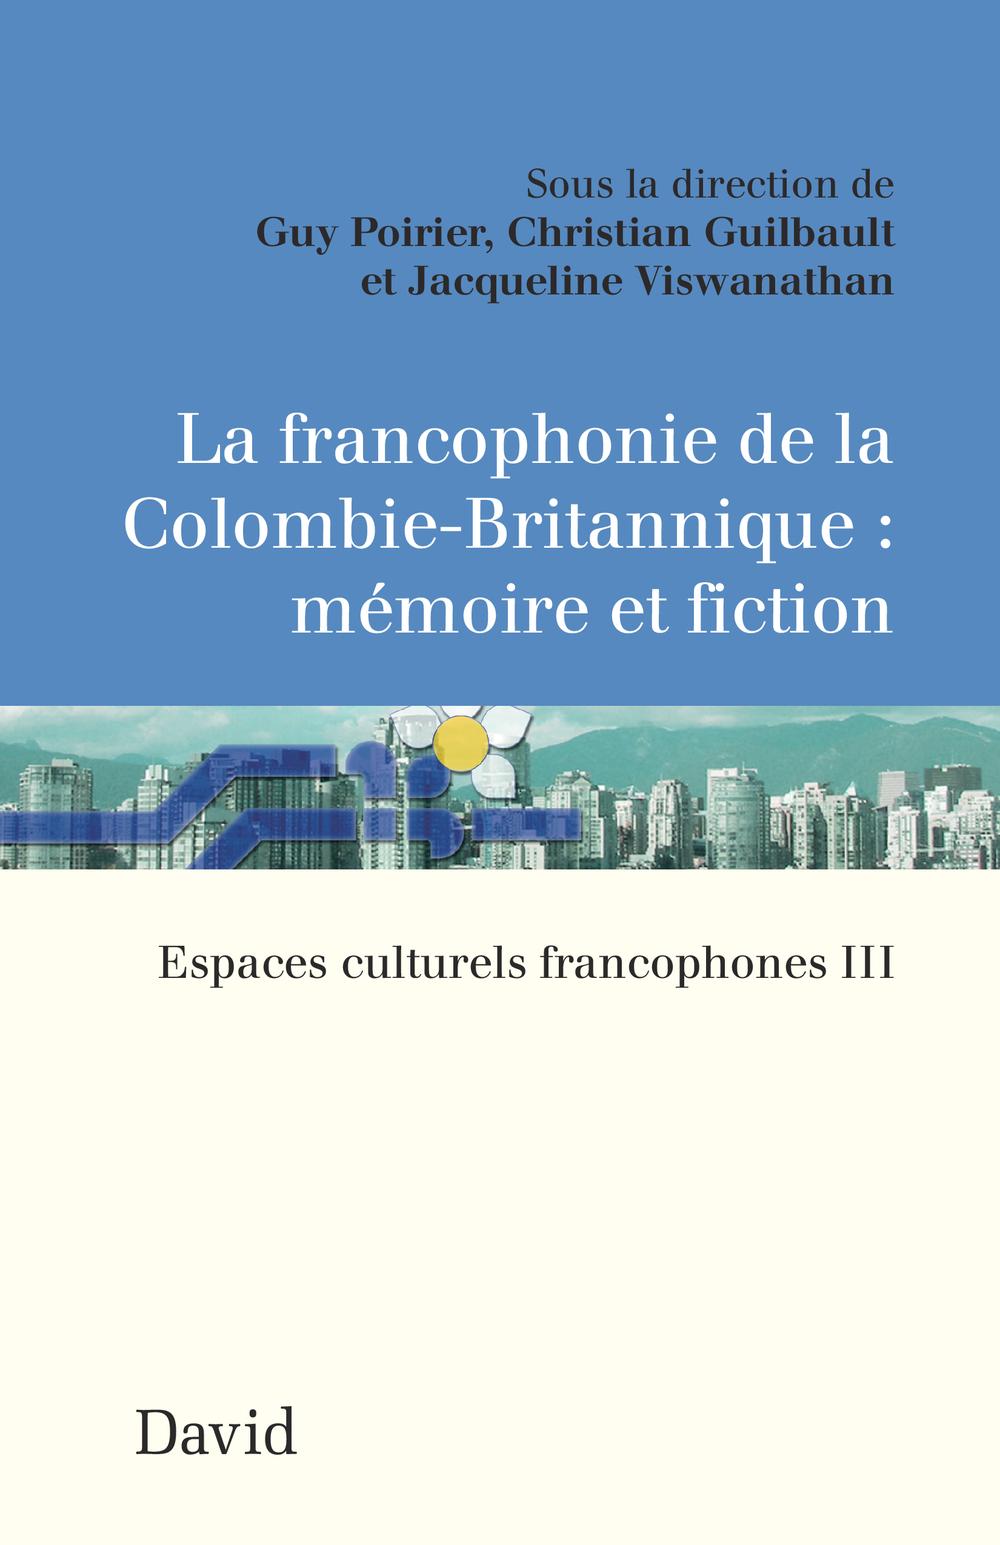 La francophonie de la Colom...